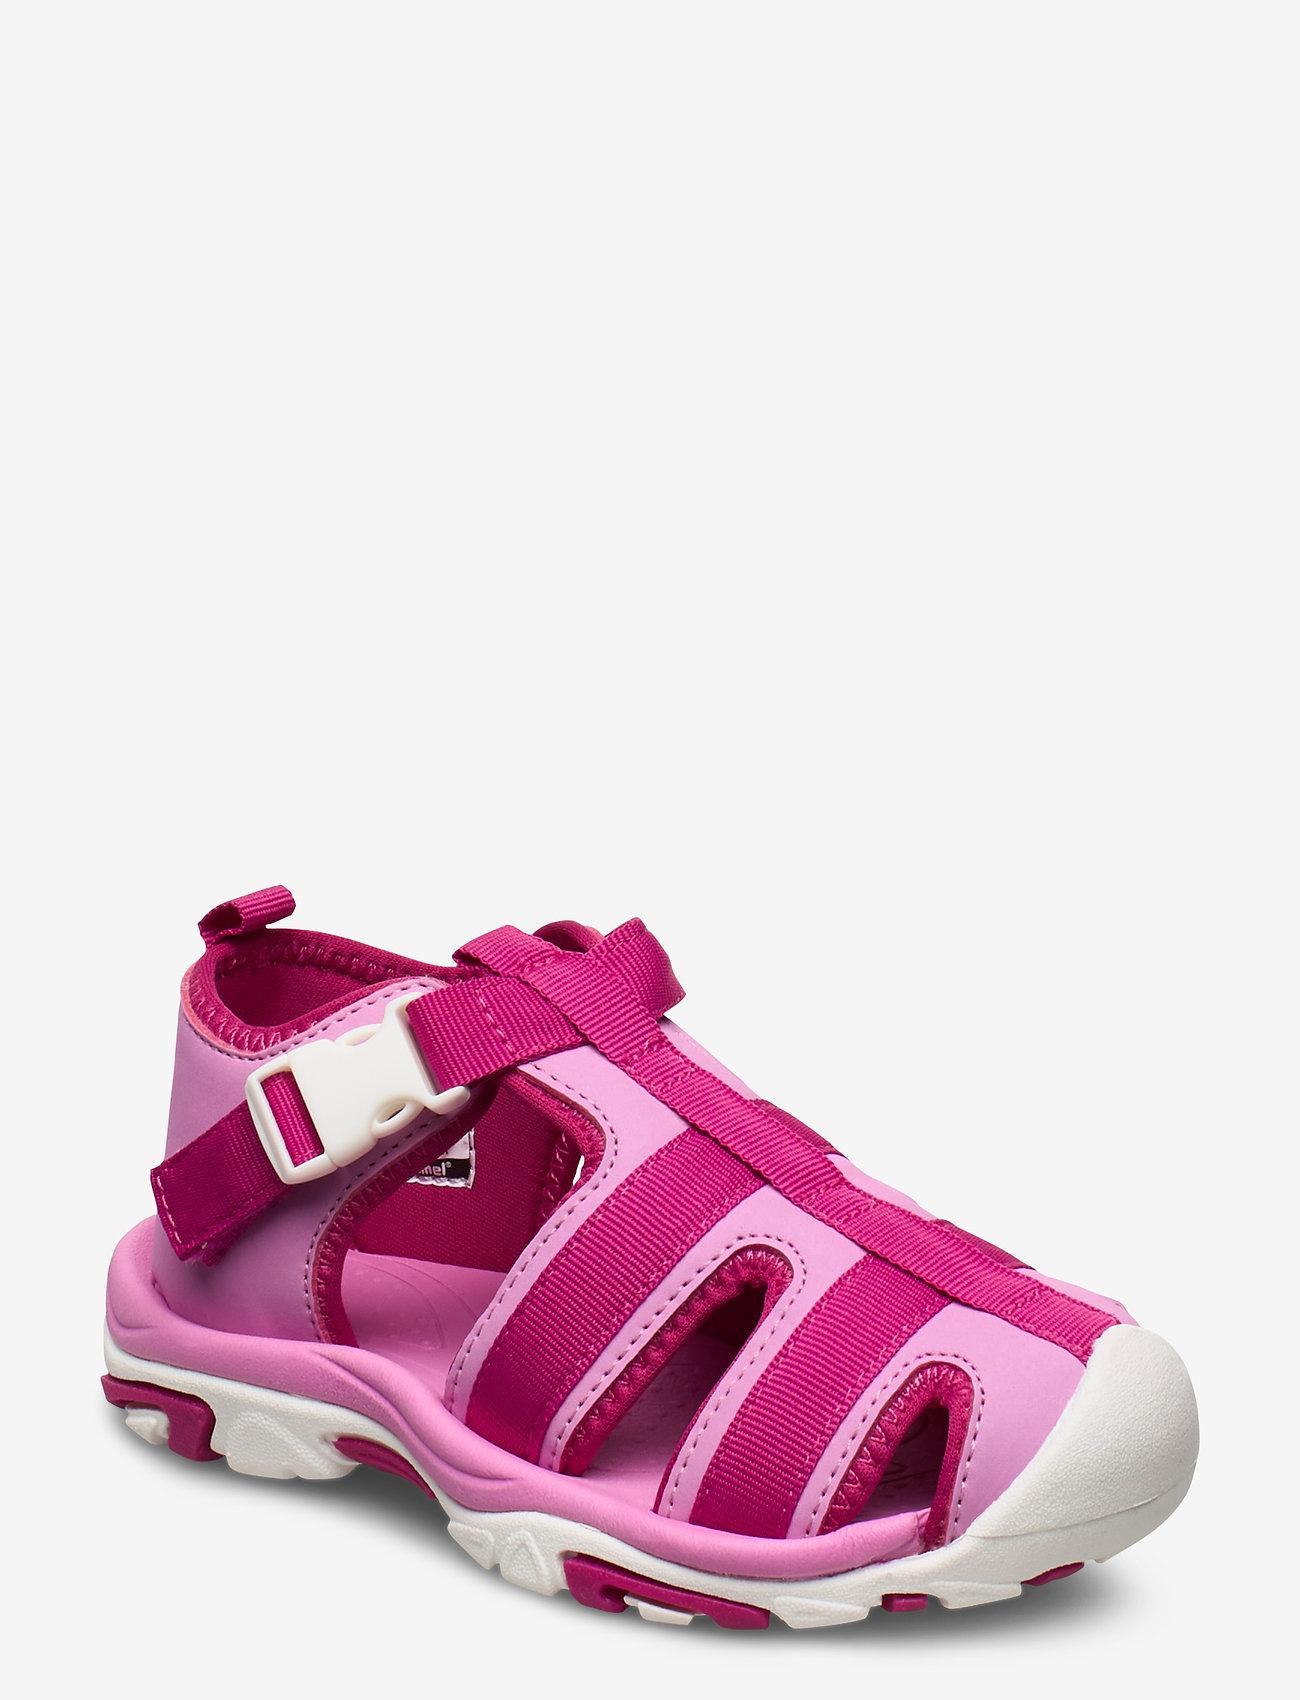 Sandal Buckle Infant (Fuchsia Pink) (15